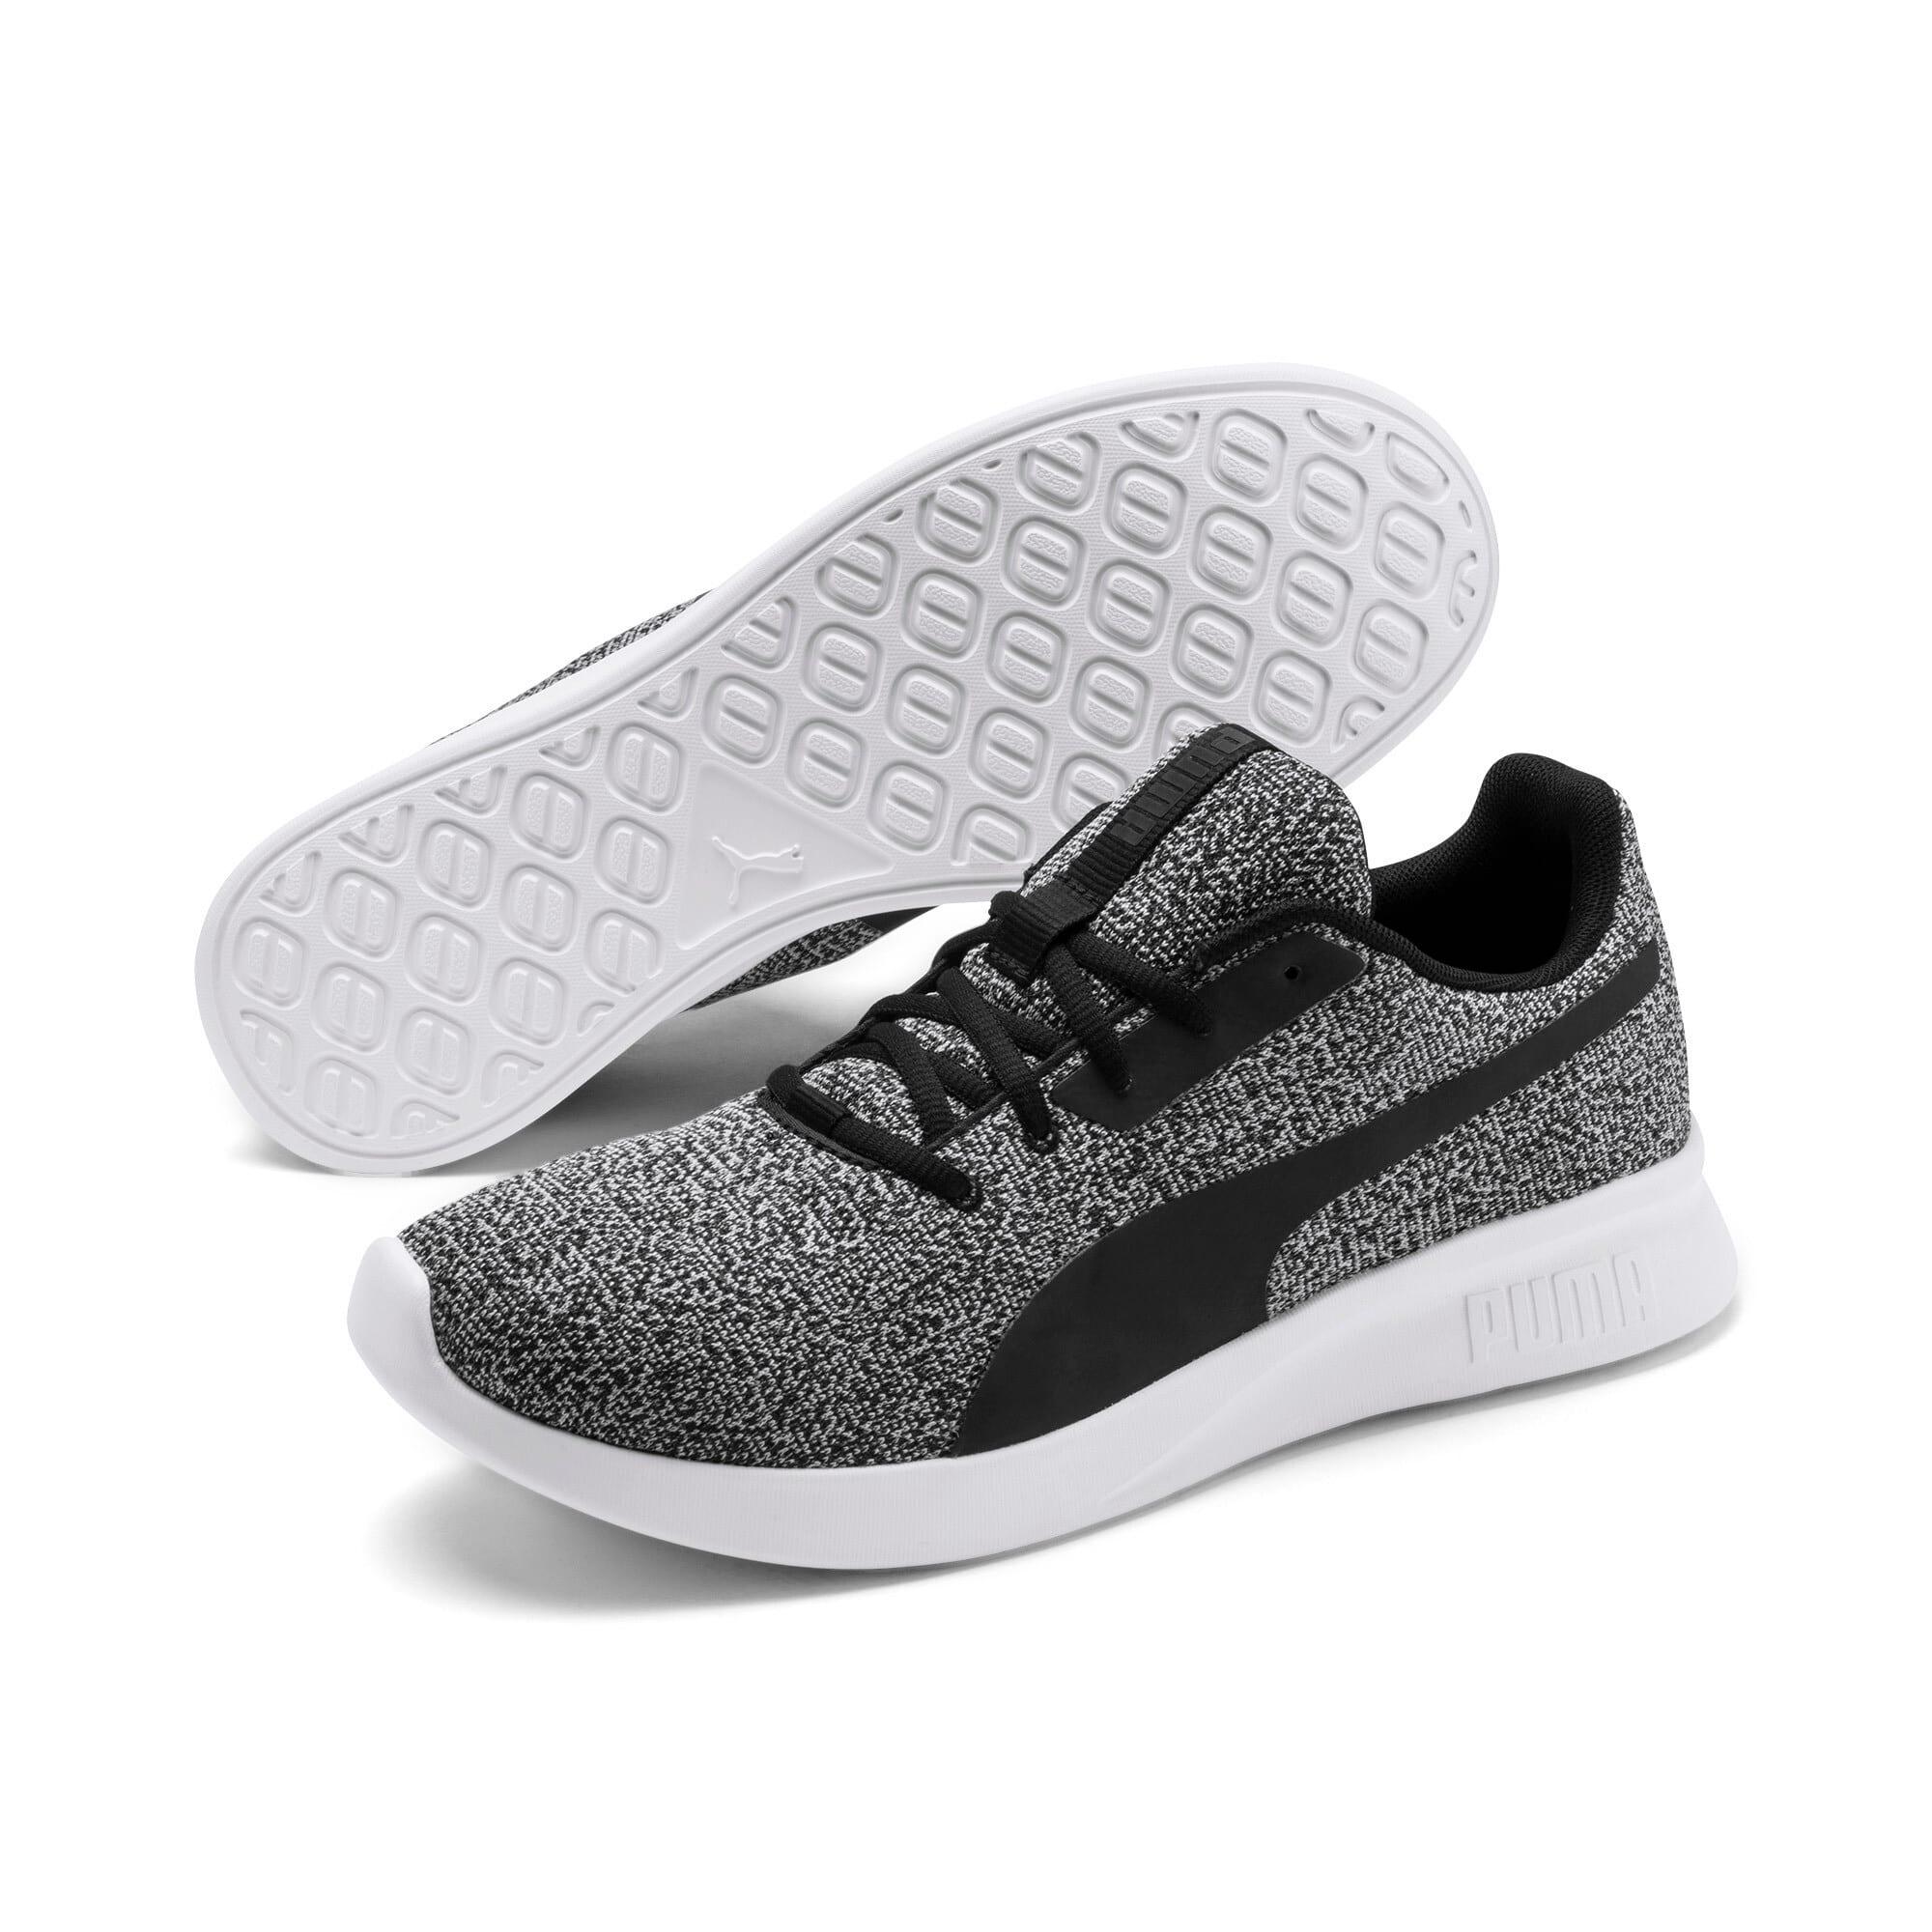 Thumbnail 4 of Modern Runner Sneakers, Gray Violet-Puma Black, medium-IND